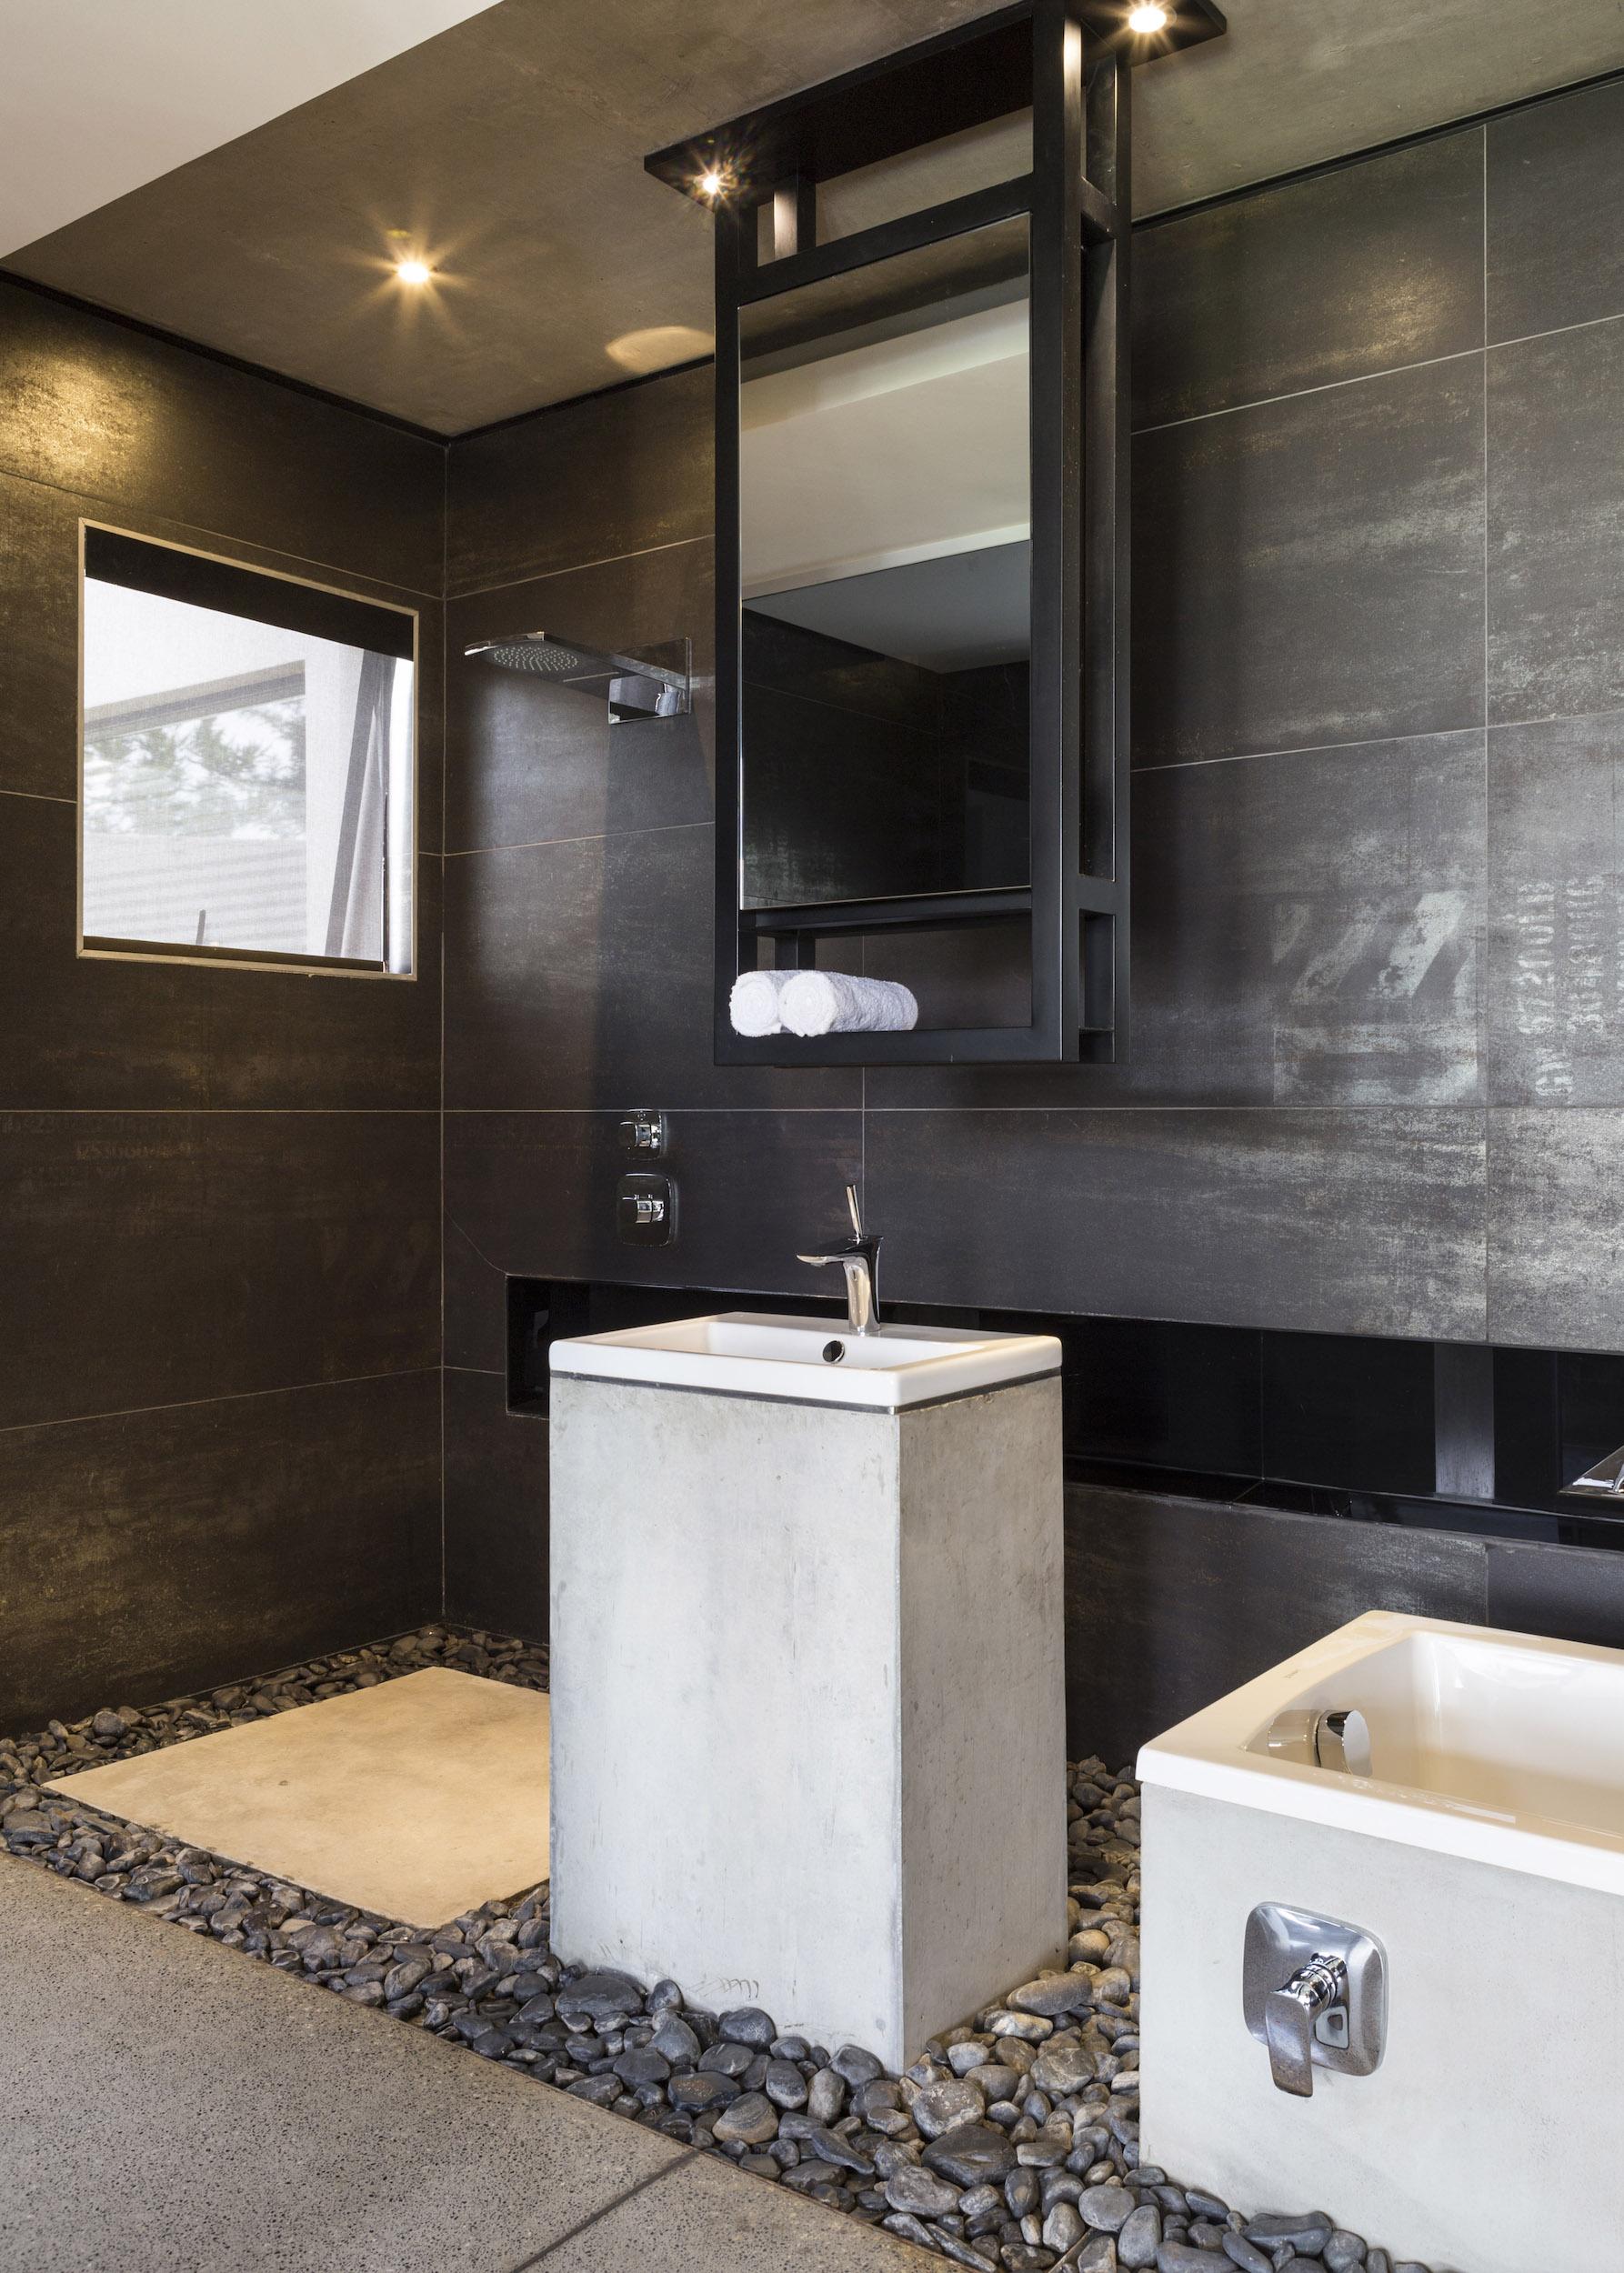 Kloof Road Masterpiece House in Johannesburg by Nico van der Meulen Architects-31